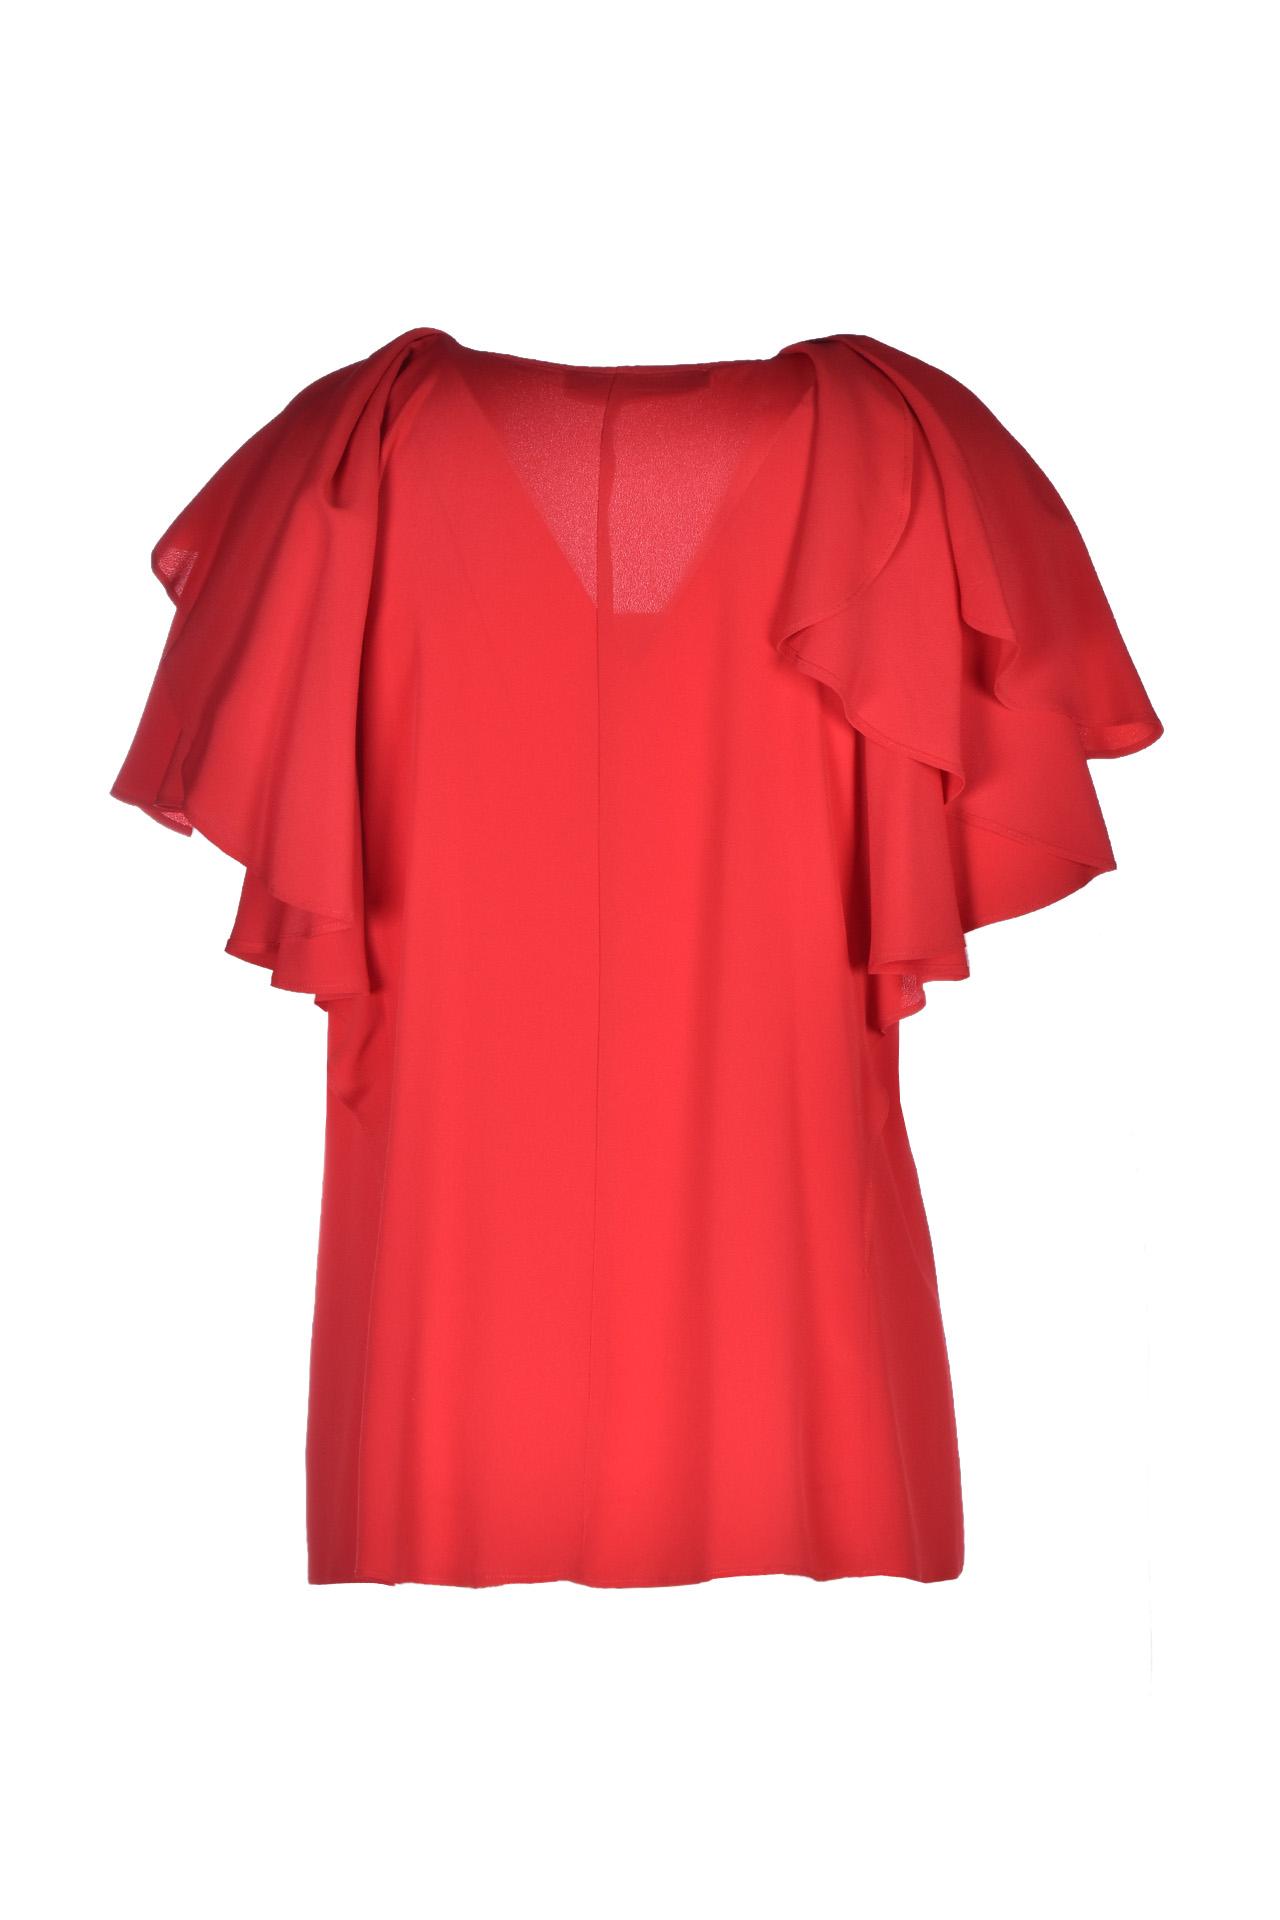 Ruffle sleeve shirt - poppy JUCCA | Blouses | J3112021656